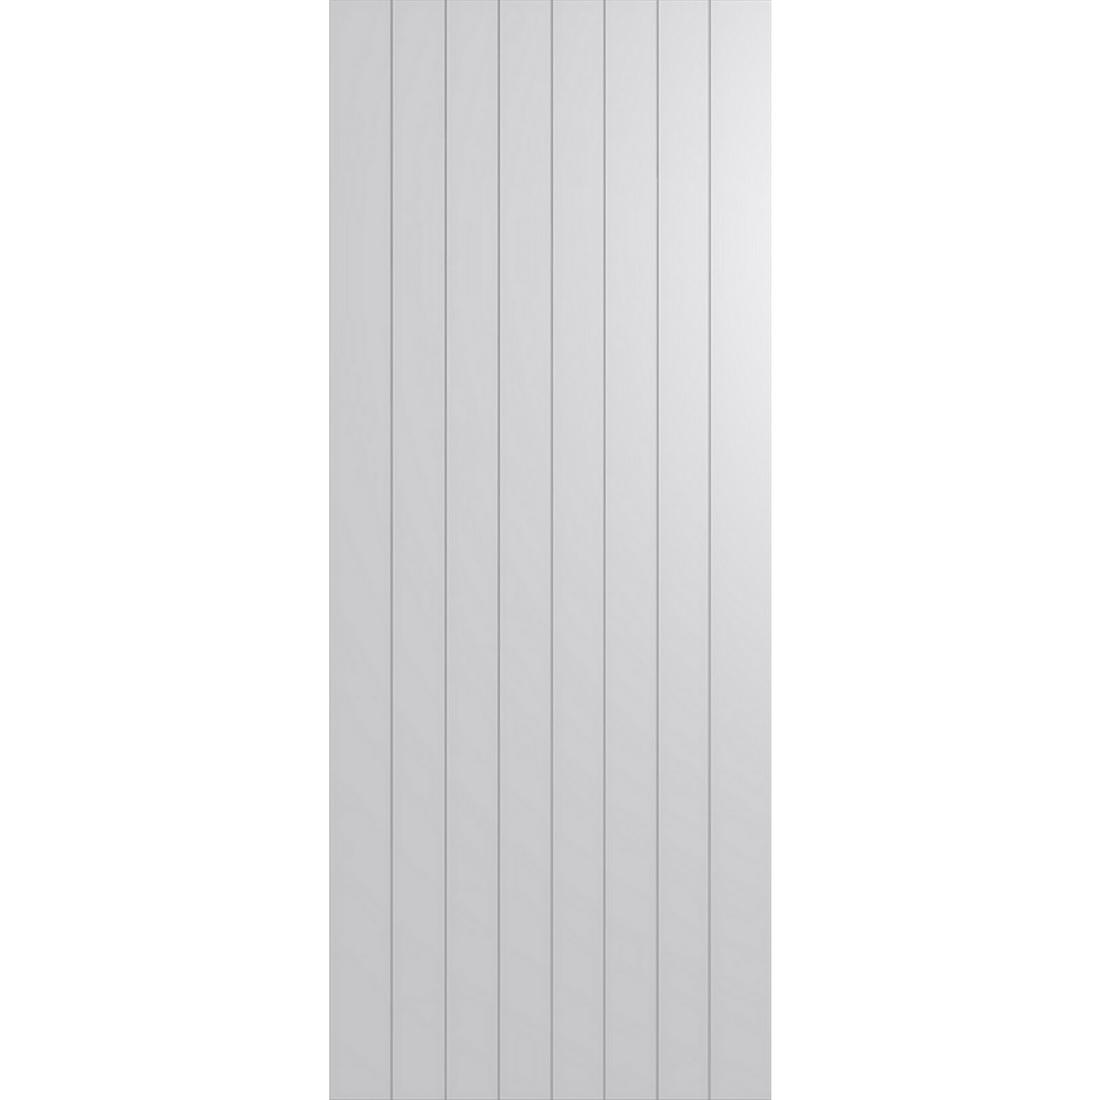 Doors Accent HAG11 Interior Door 1980 x 860 x 35mm Hollow Core Pre-Primed MDF Skin HAG11351980860